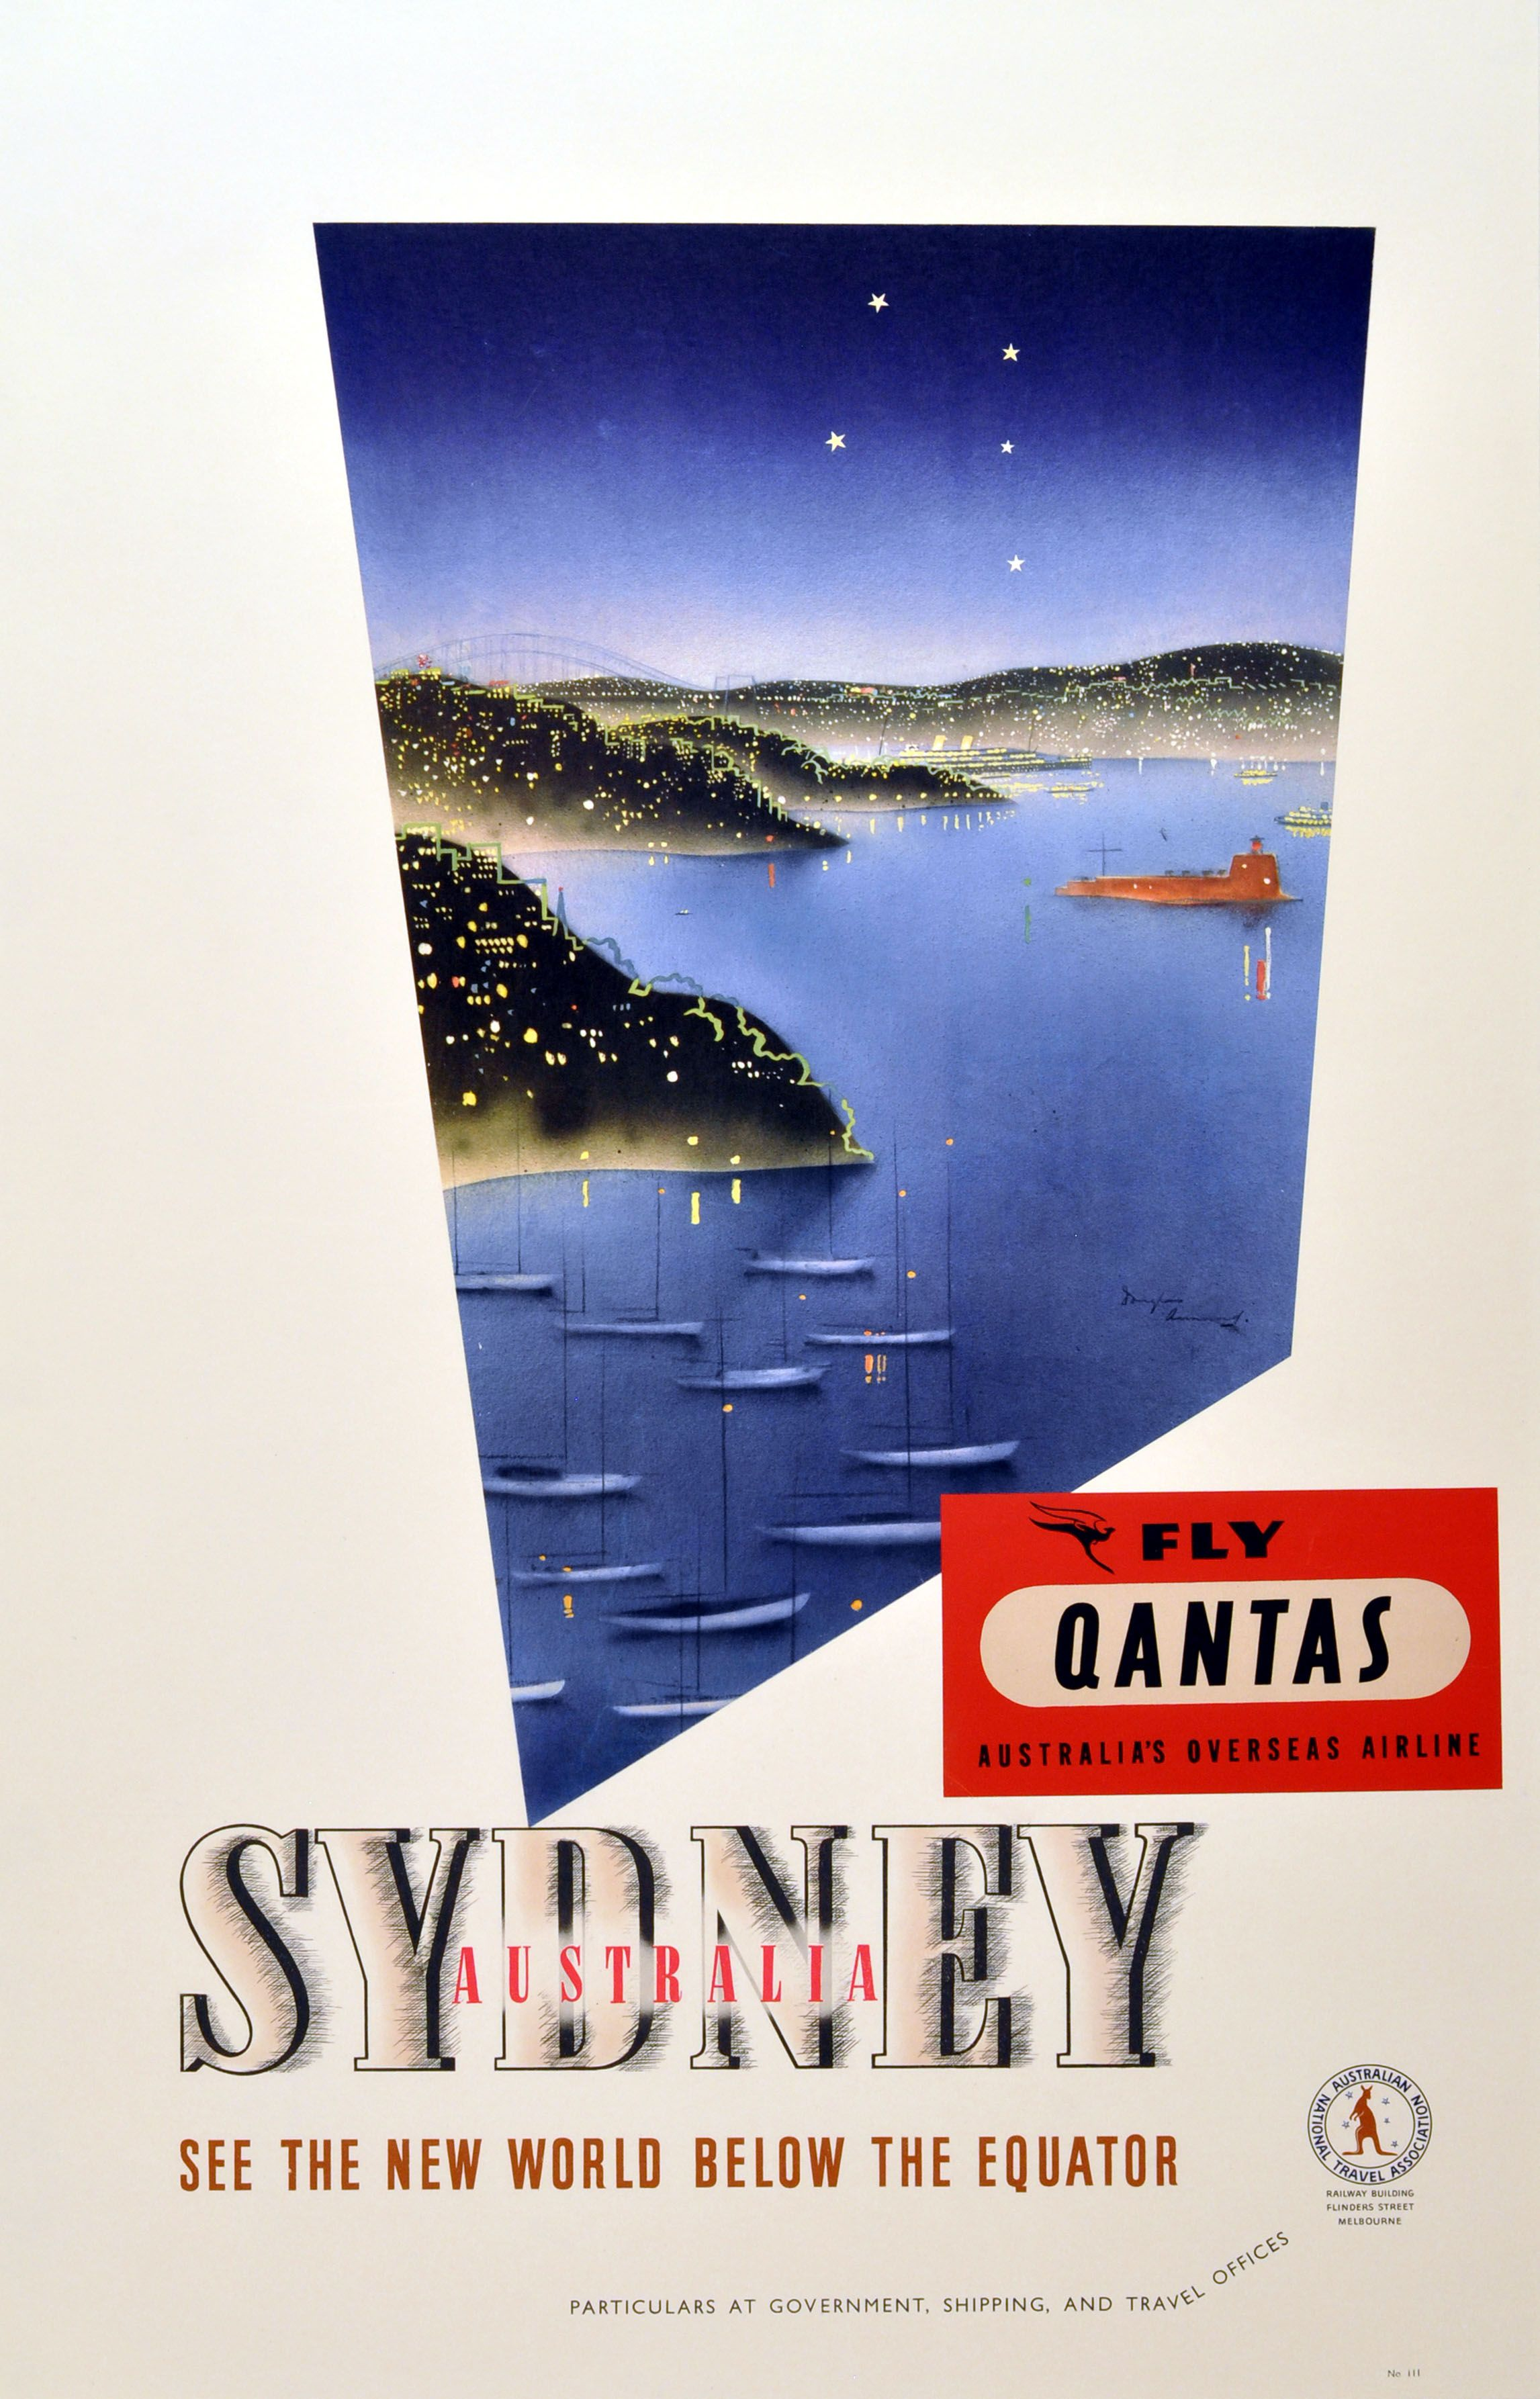 Sydney Australia By Qantas 1930s Original Vintage Poster By Douglas Annand Listed On Antikbar Co Uk Travel Posters Vintage Travel Posters Travel Advertising